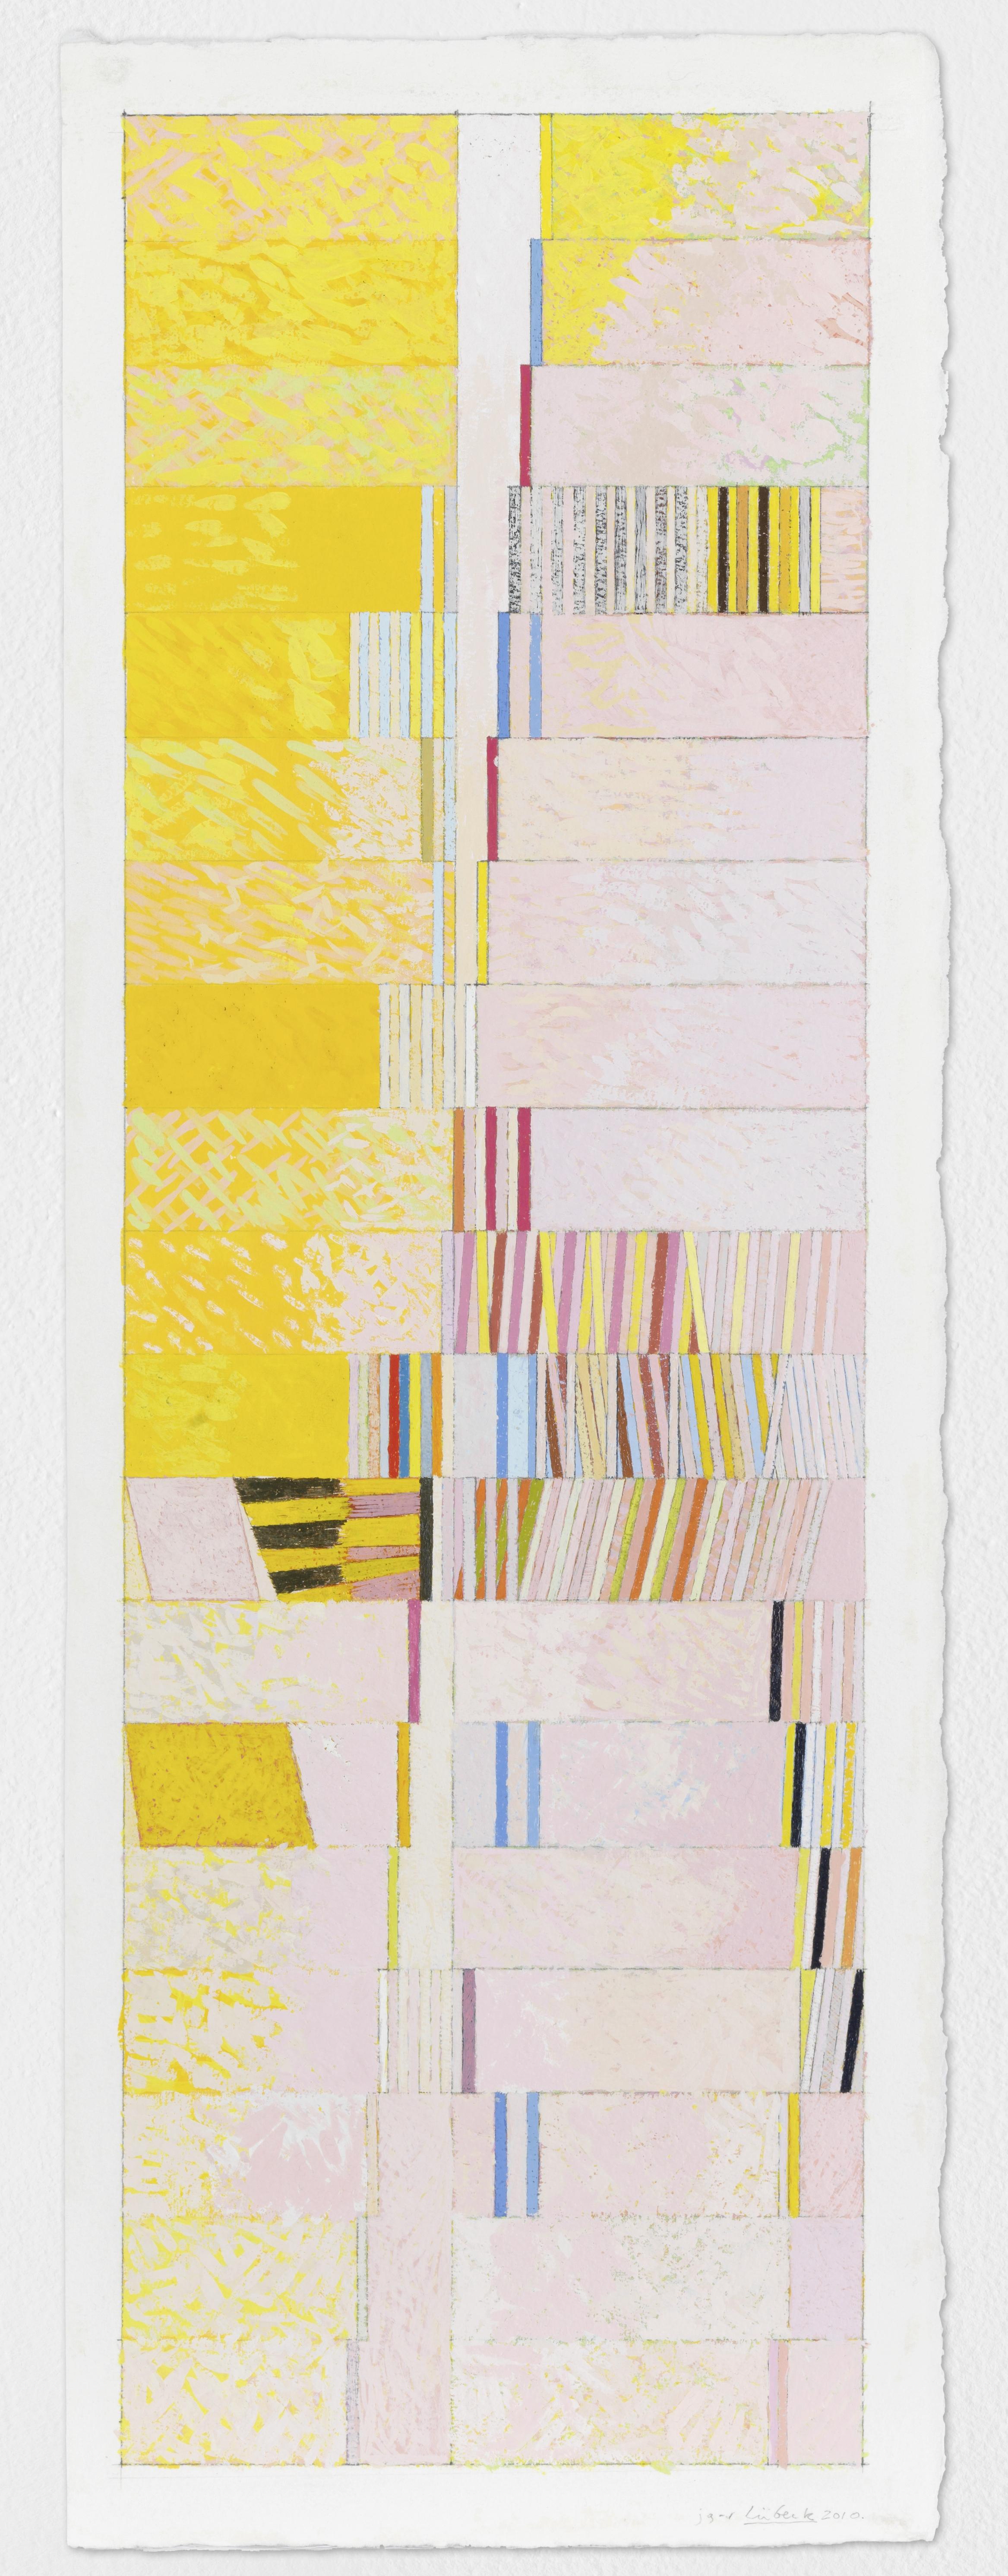 "Lübeck, 2010, gouache on paper, 30""x10 1/2"""